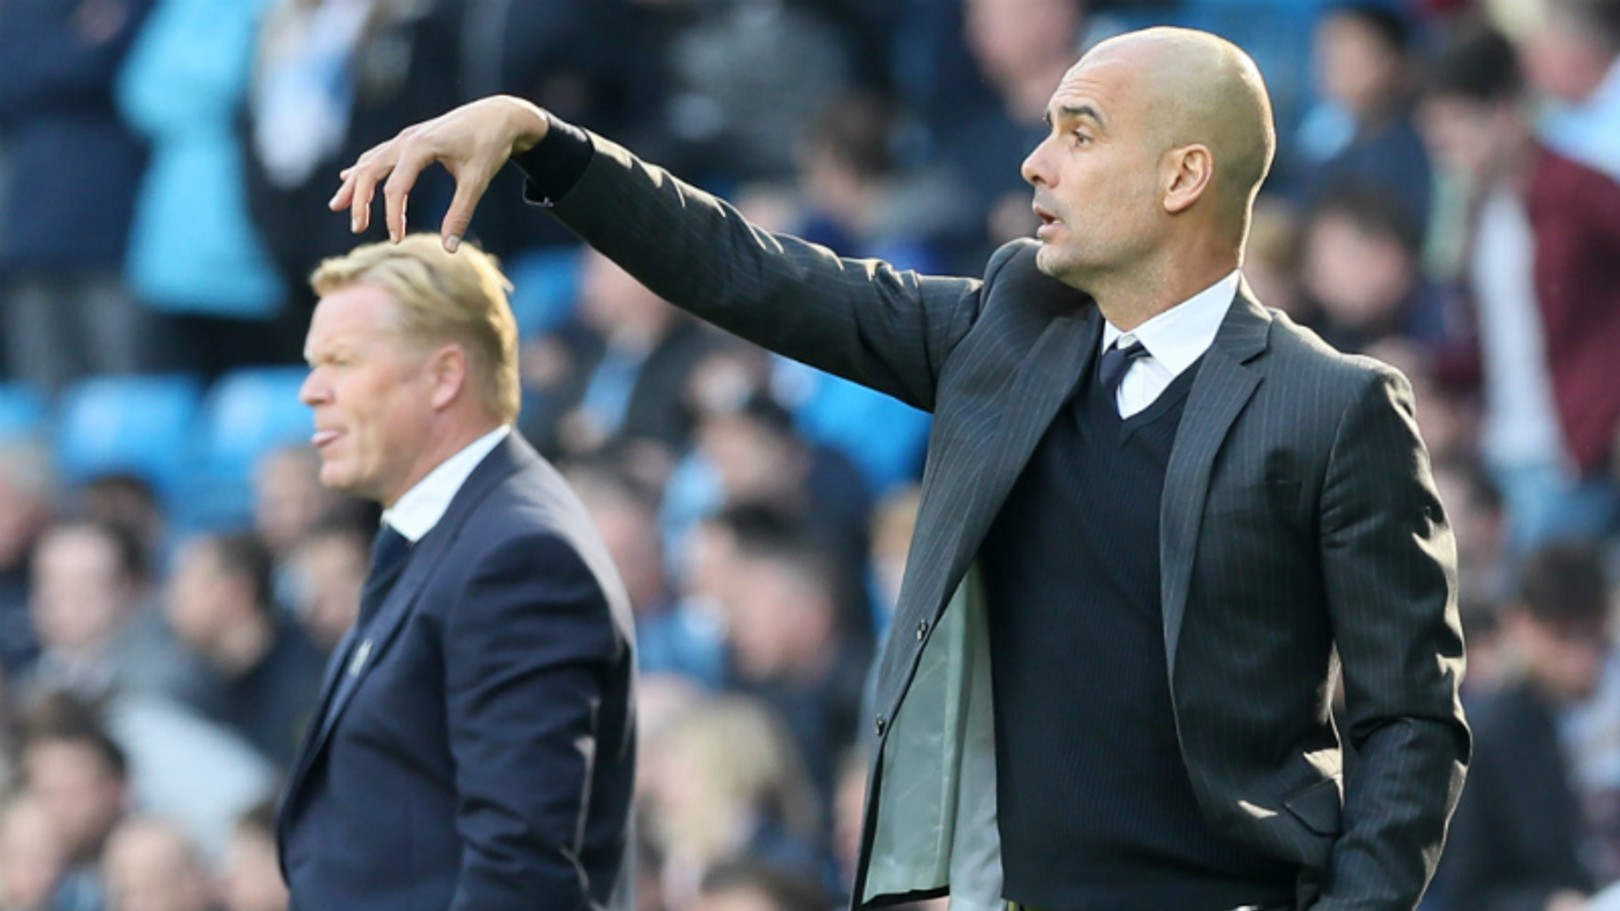 CALLING THE SHOTS: Manager Pep Guardiola and Ronald Koeman